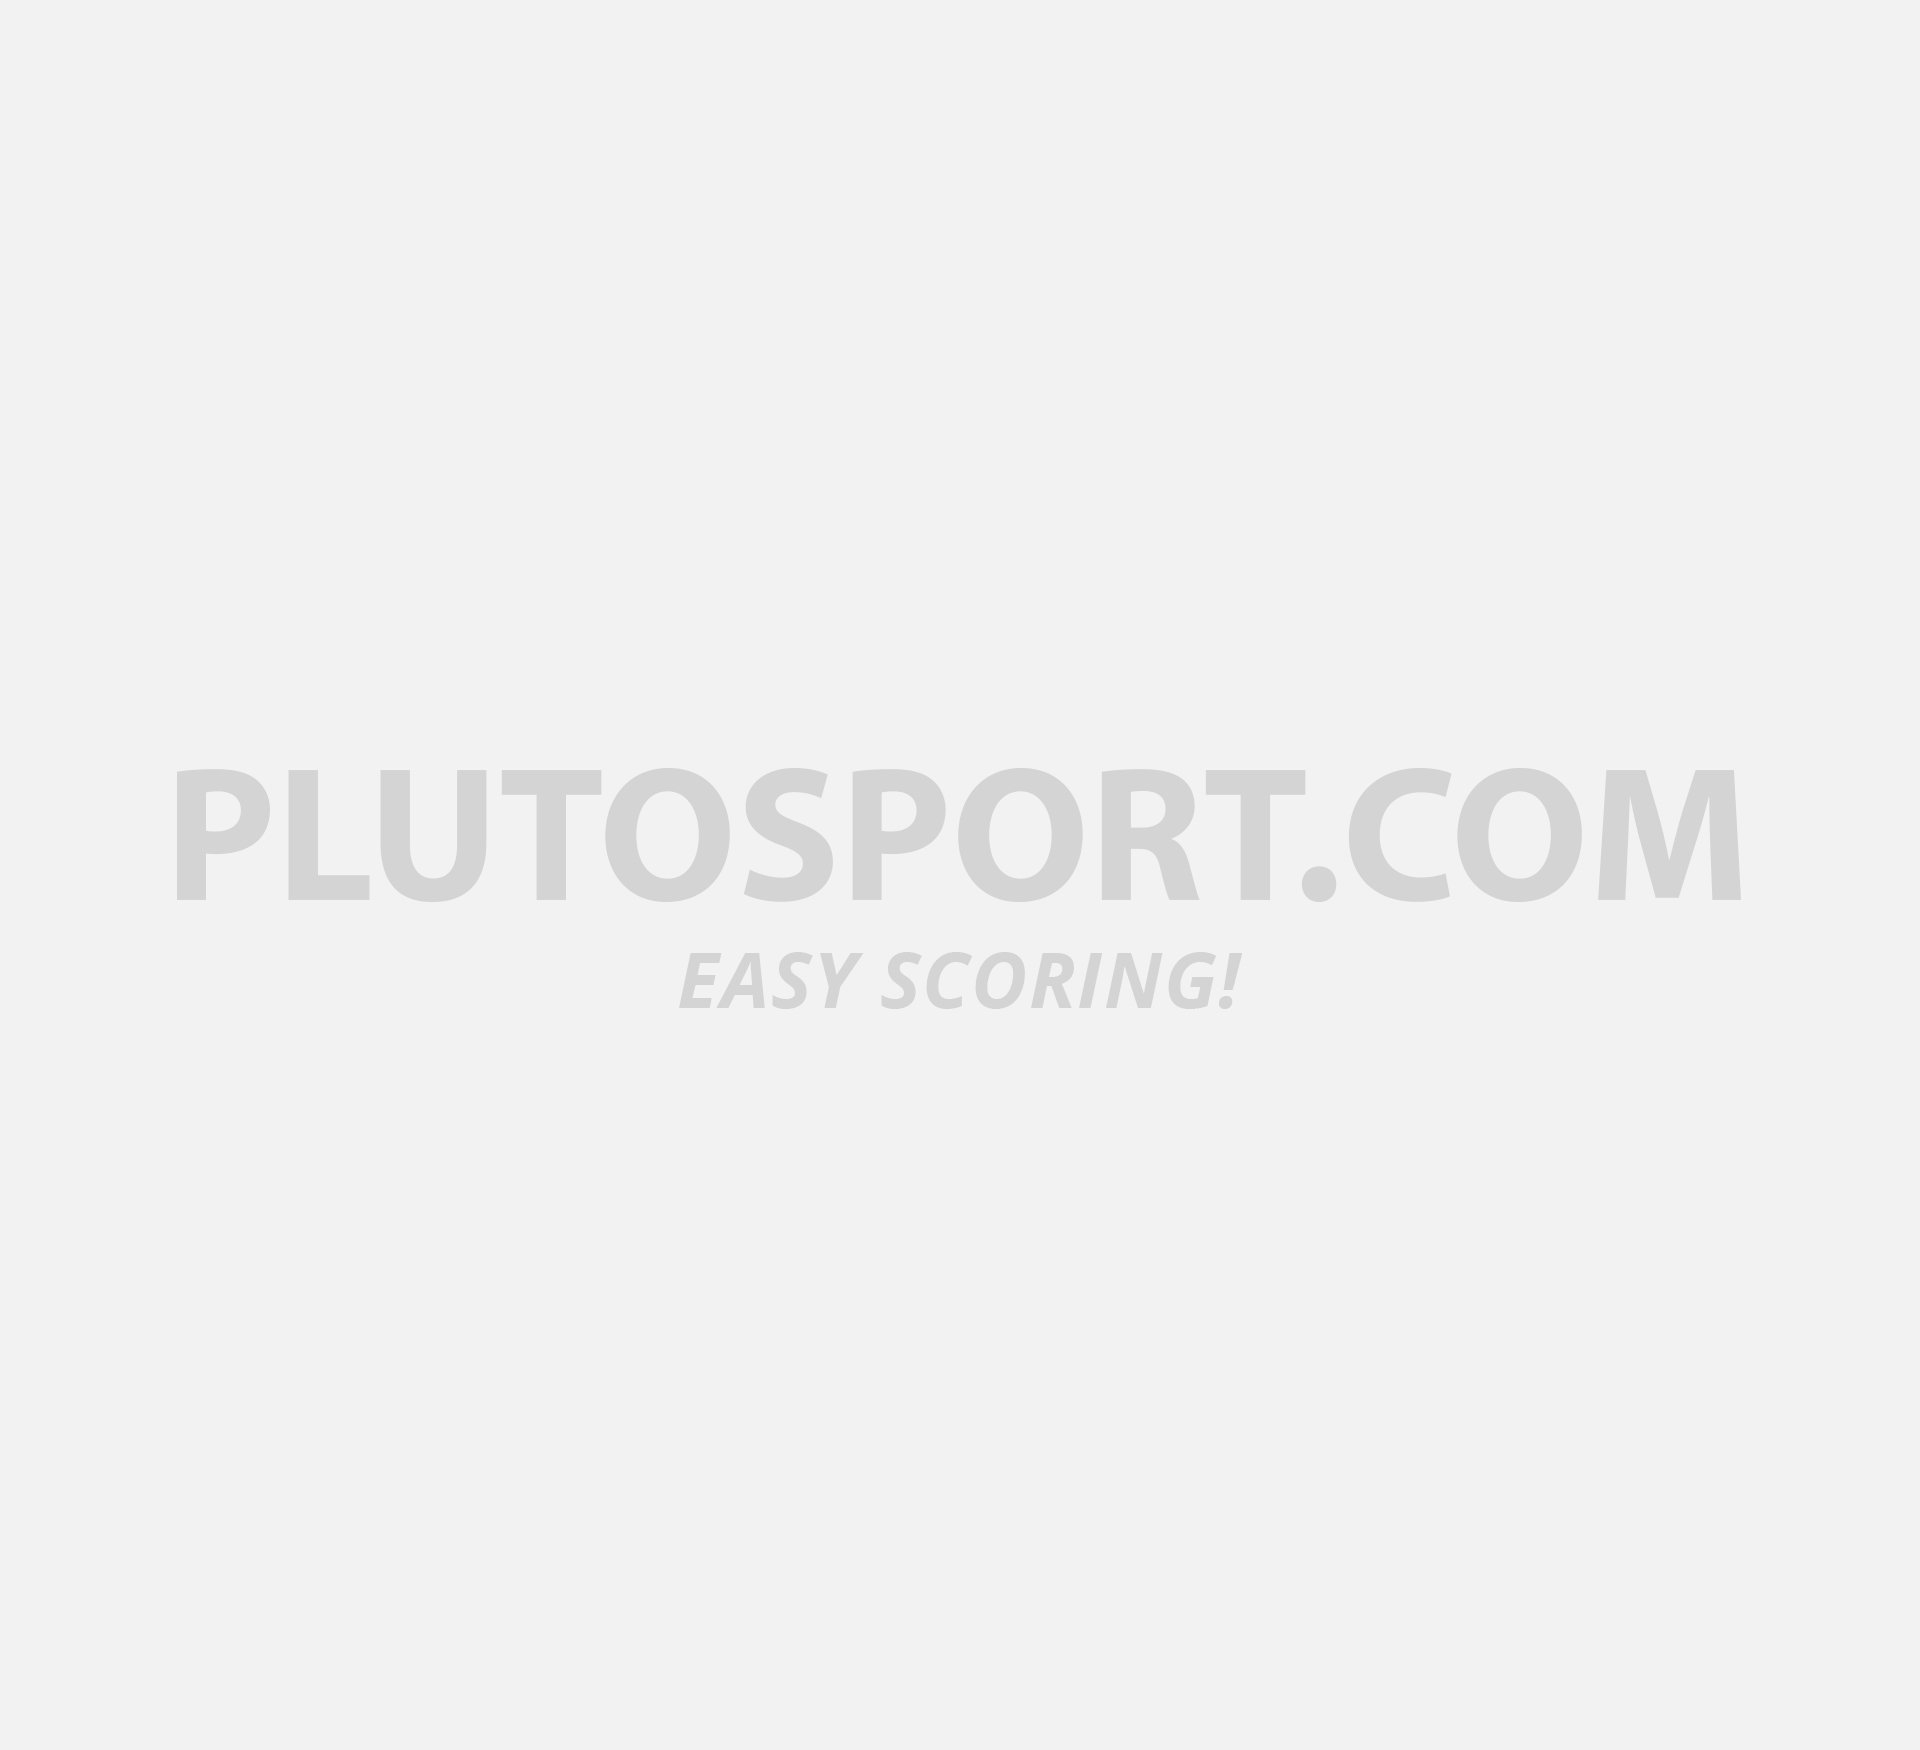 reputable site d89a7 e6918 Adidas ACE 17.4 FxG Jr - Turf shoes - Shoes - Football - Sports  Plutosport